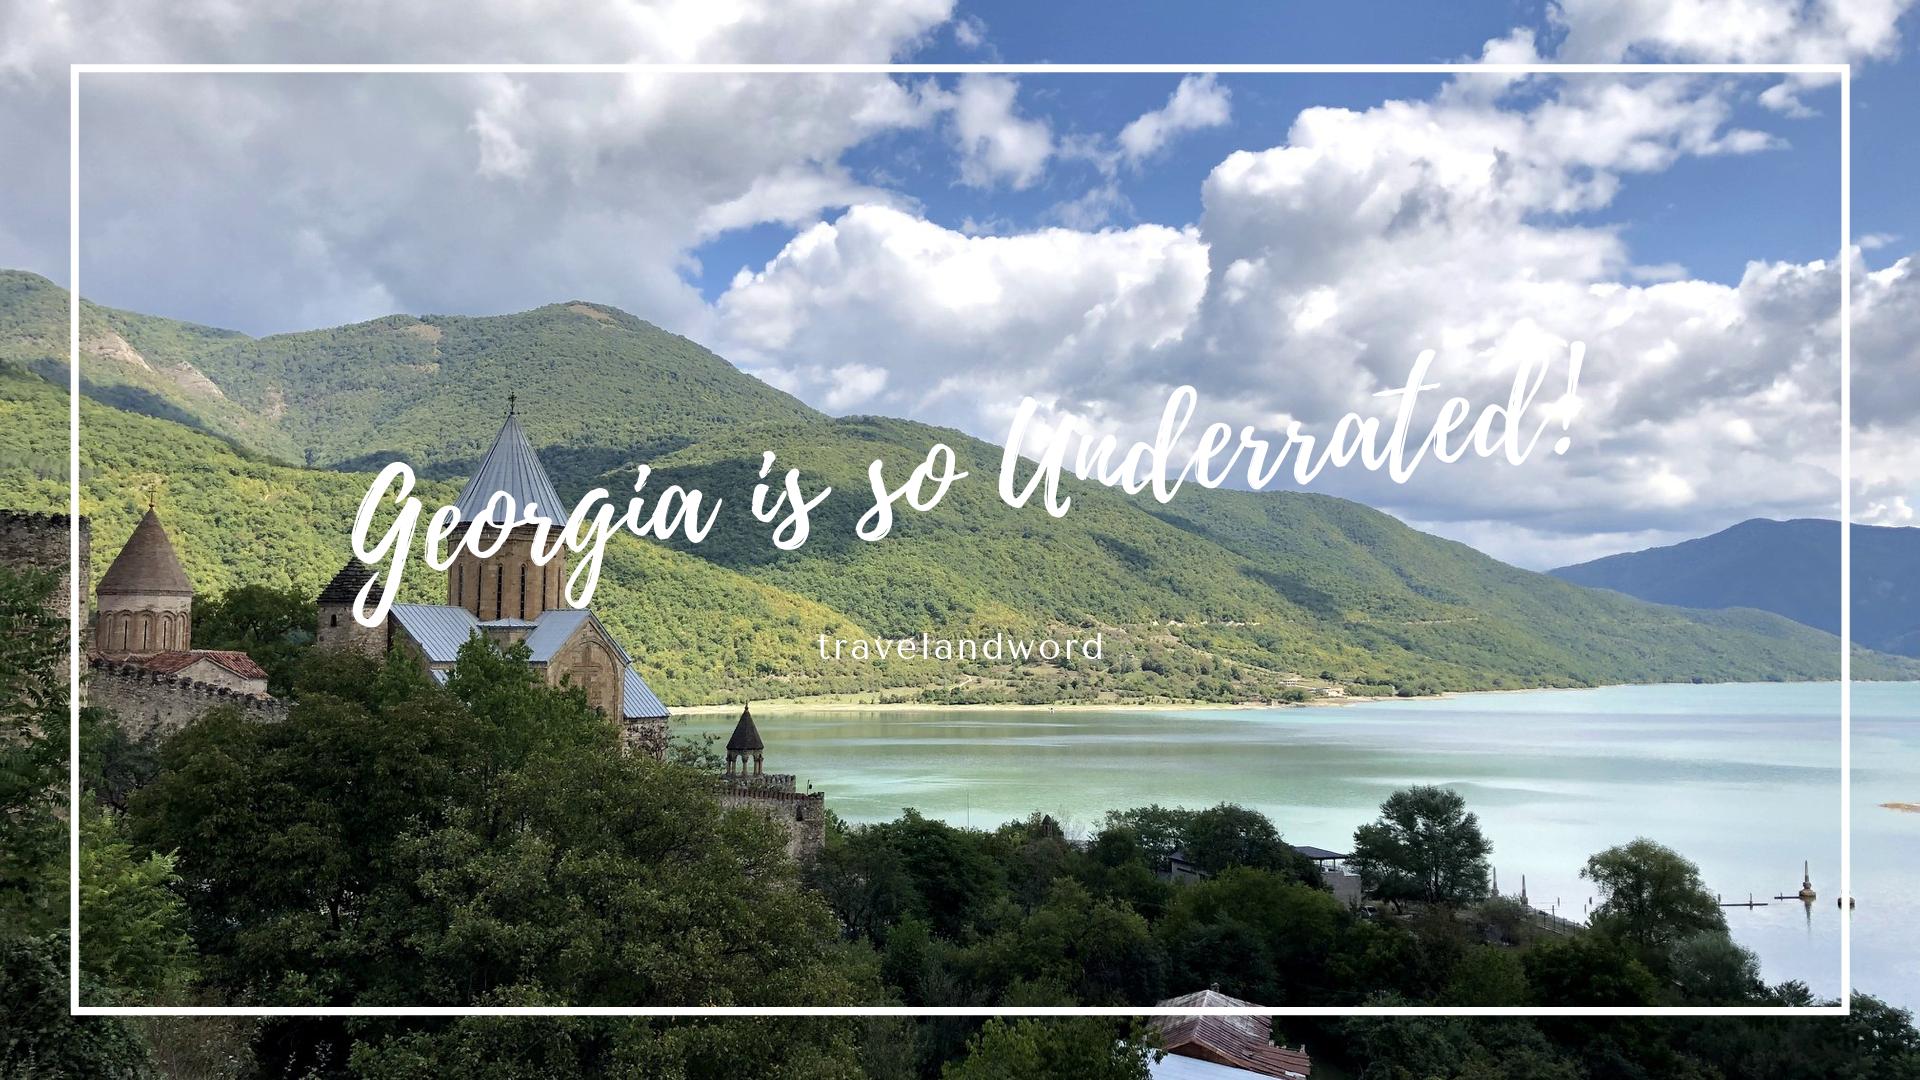 Georgia is so Underrated!